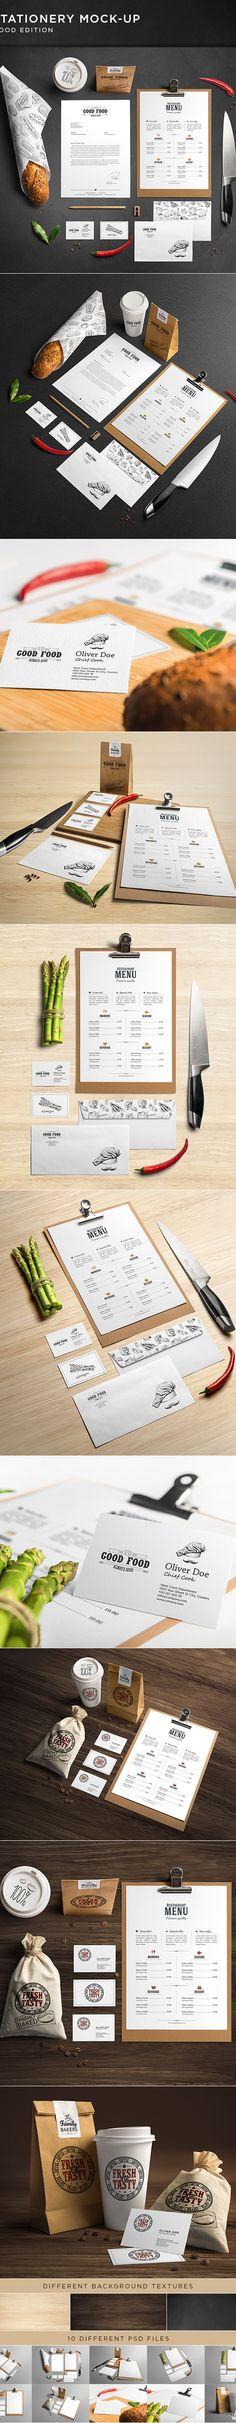 Stationery / Branding Mock-Up Mock-Up by Andrej Sevkovskij, via Behance